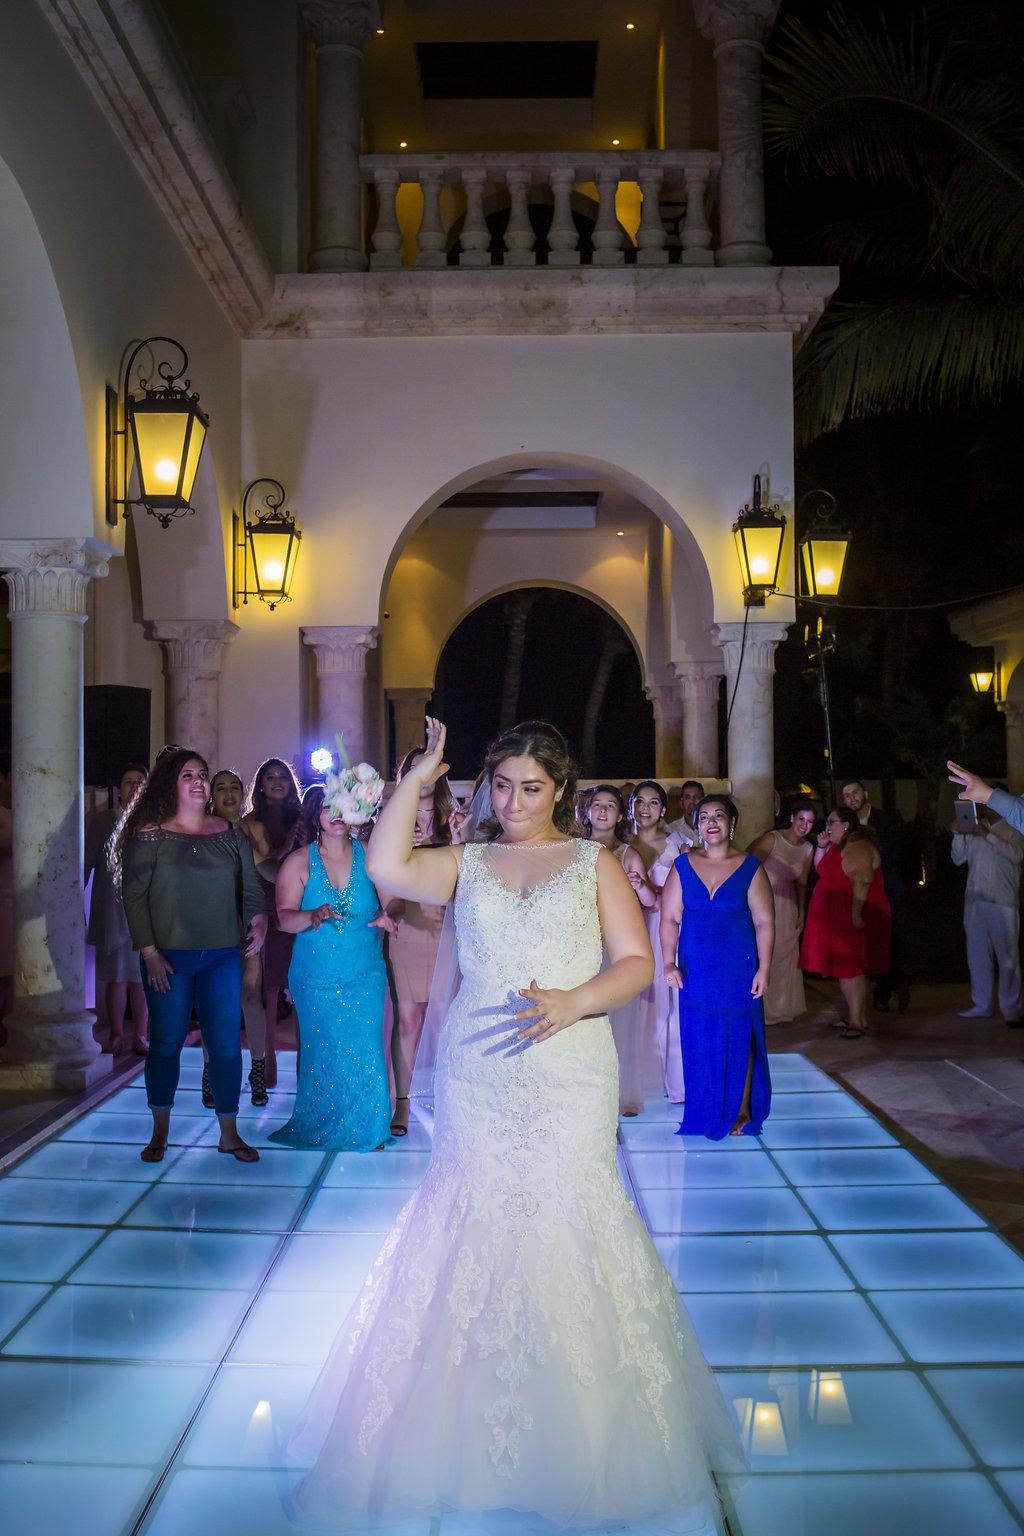 yesica-jose-beach-wedding-Villa-La-Joya--Playa-del-carmen-01--42.jpg